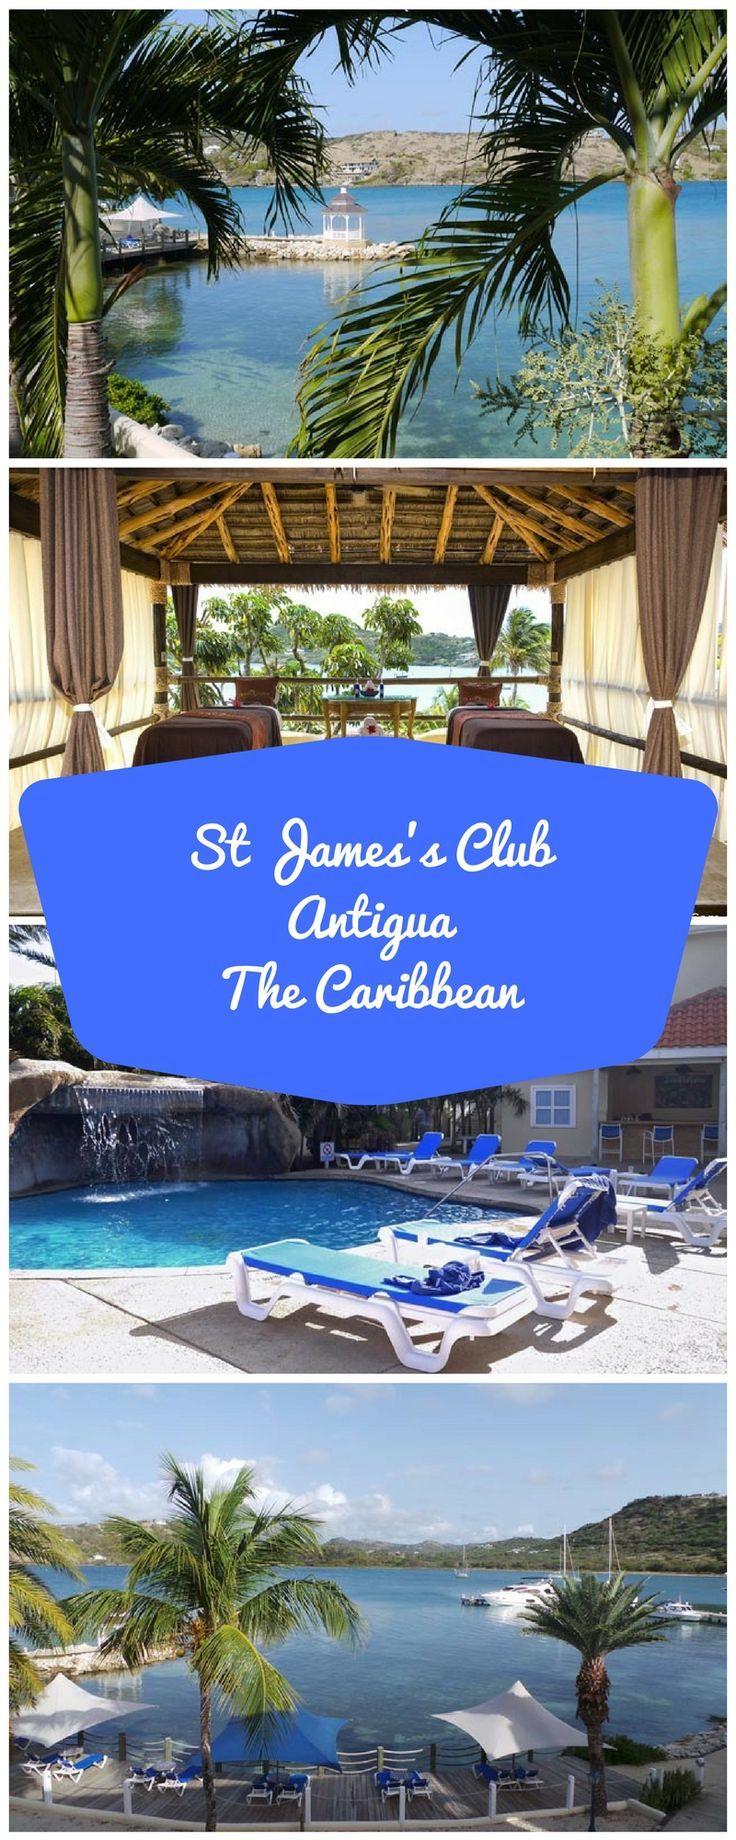 St James's Club - Antigua - Caribbean, St James's Club Antigua, Luxury Caribbean Resort, Antigua luxury resort